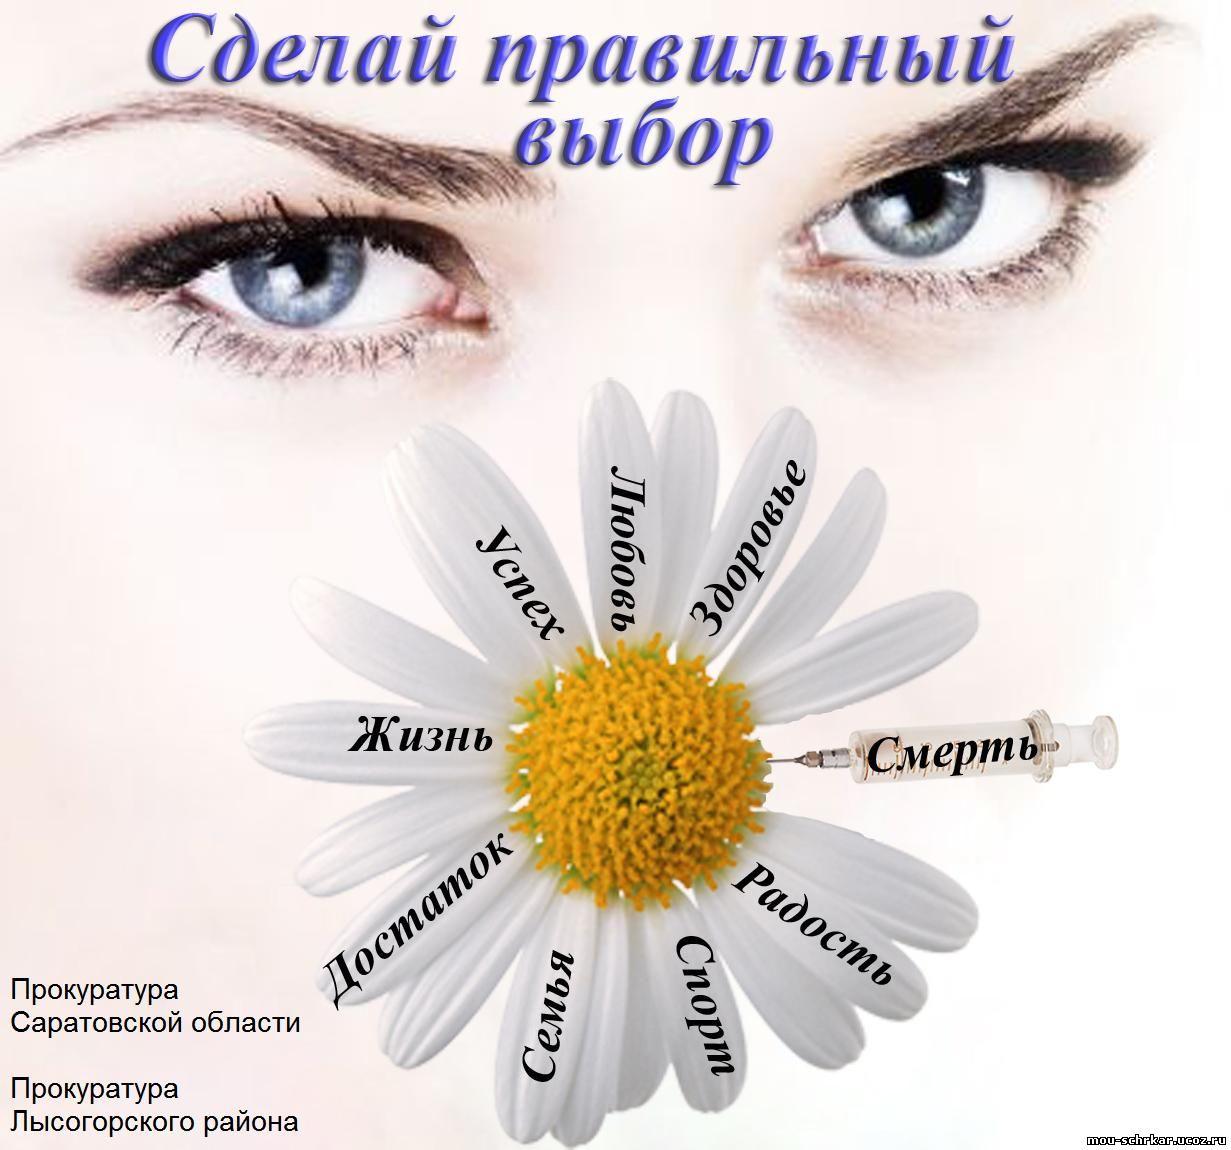 http://mou-schrkar.ucoz.ru/prokuratura_risunok_romashka.jpg